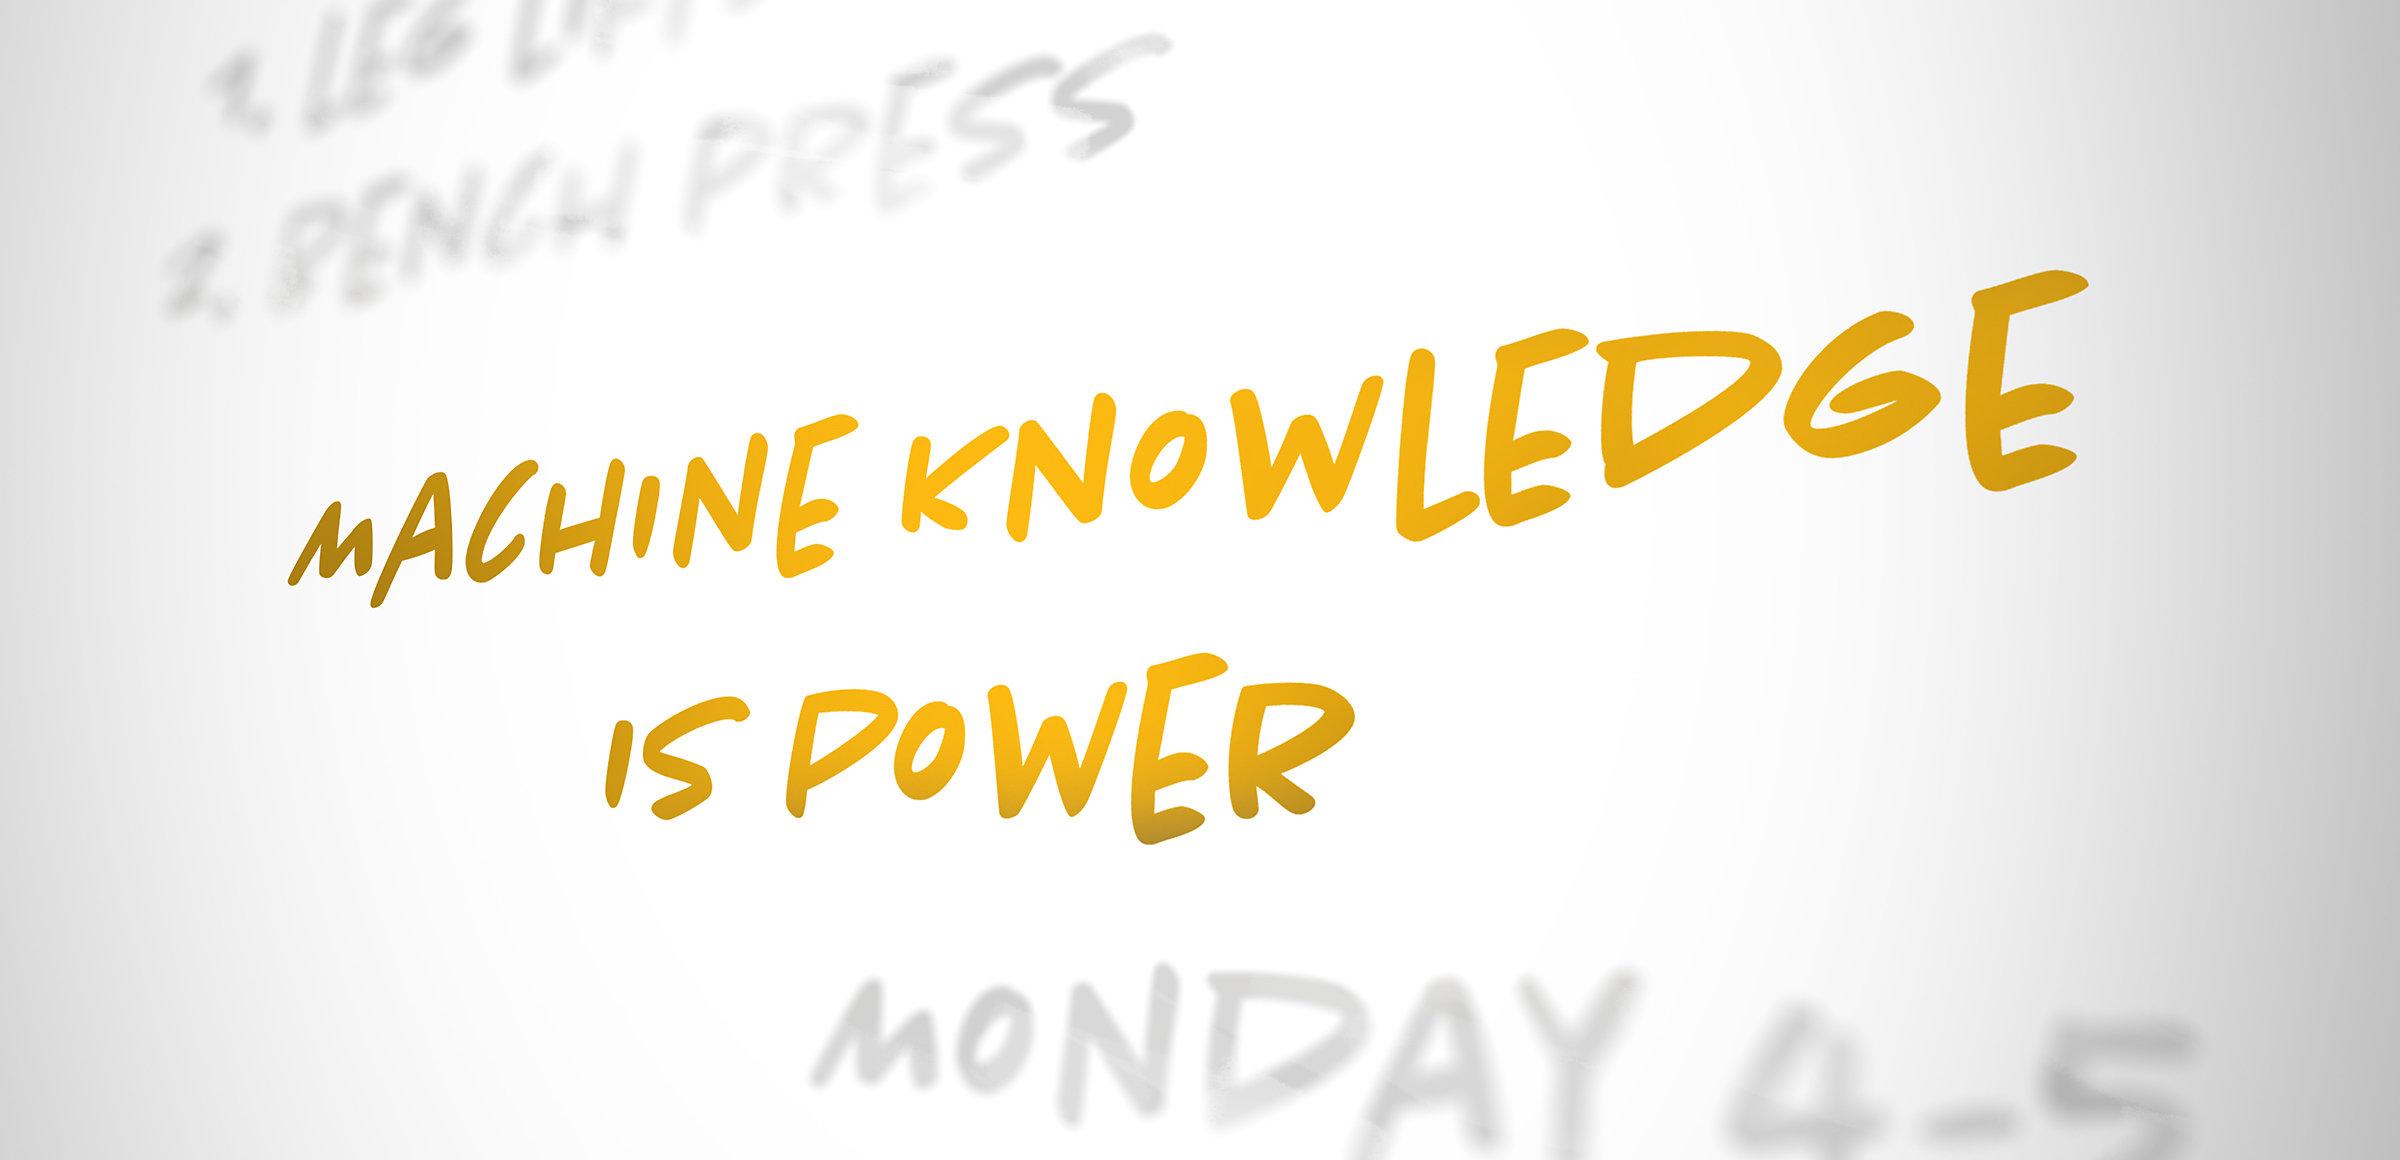 Machine Knowledge is Power